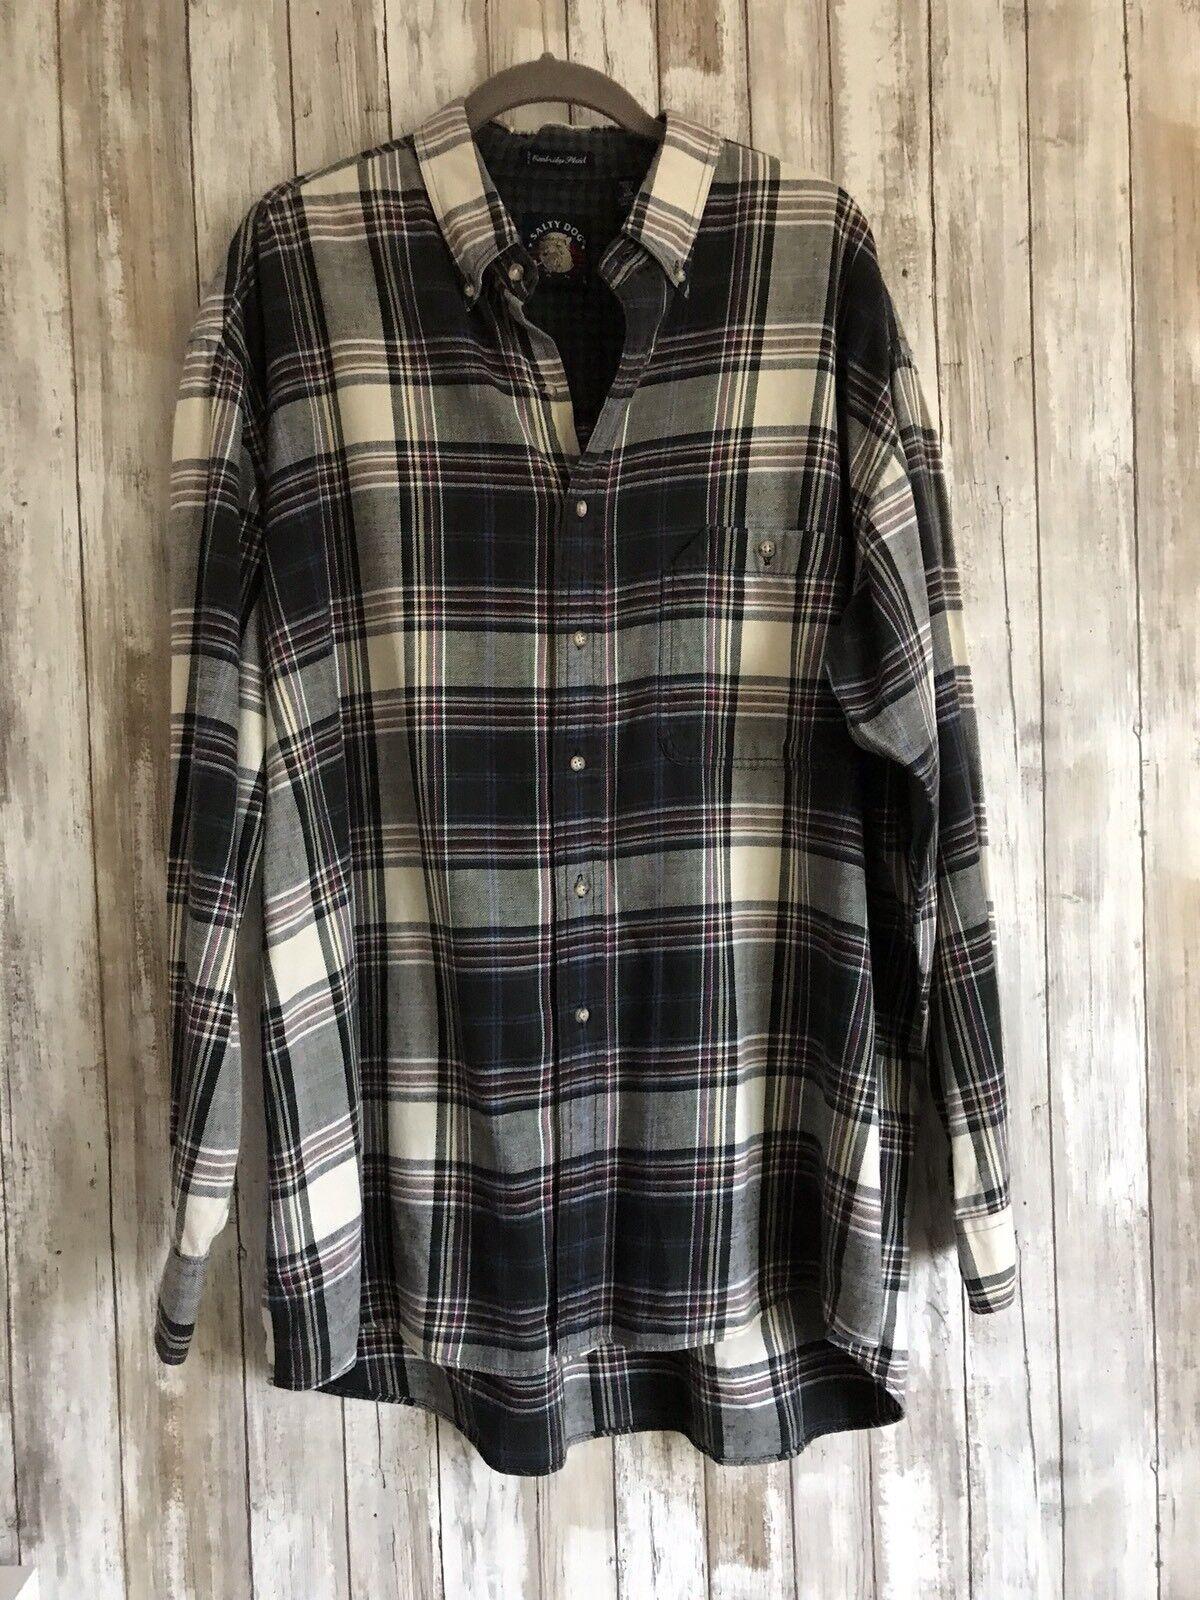 GANT Salty Dog Cambridge Plaid 1X Big Flannel Shirt Button Down Long Sleeve